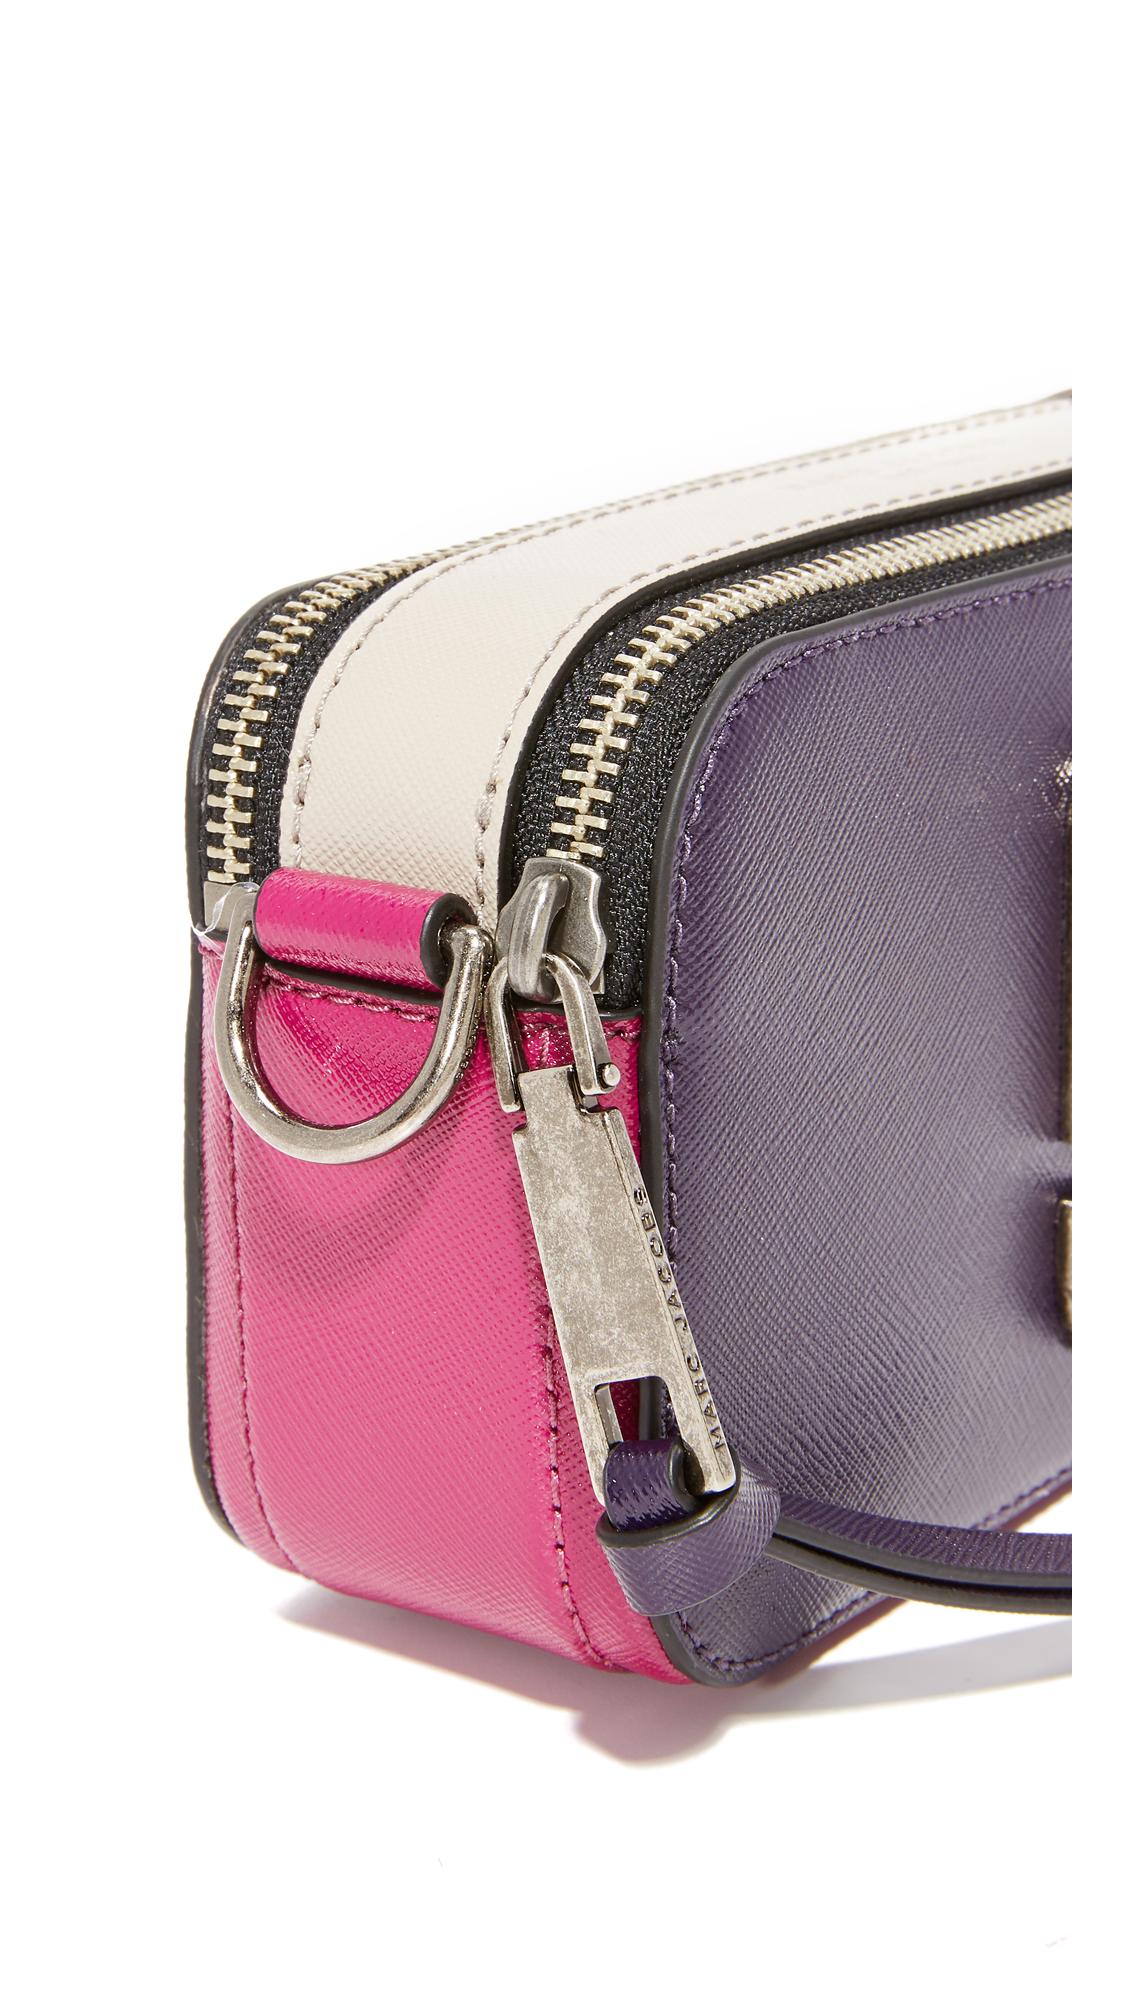 61e1227161eec Marc Jacobs Snapshot Camera Bag | SHOPBOP